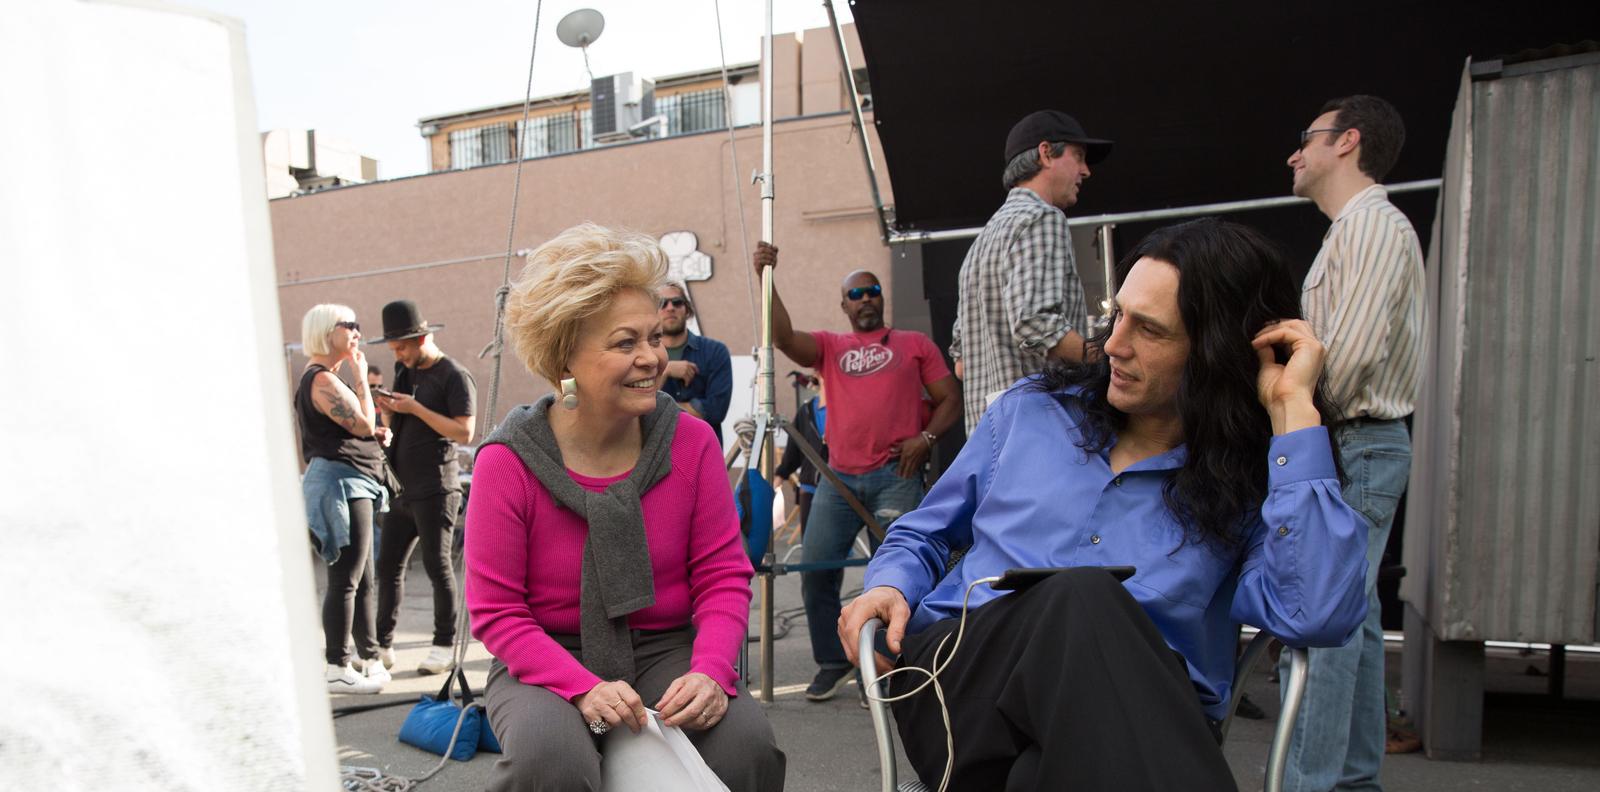 Jackie Weaver + James Franco behind the scenes on The Disaster Artist